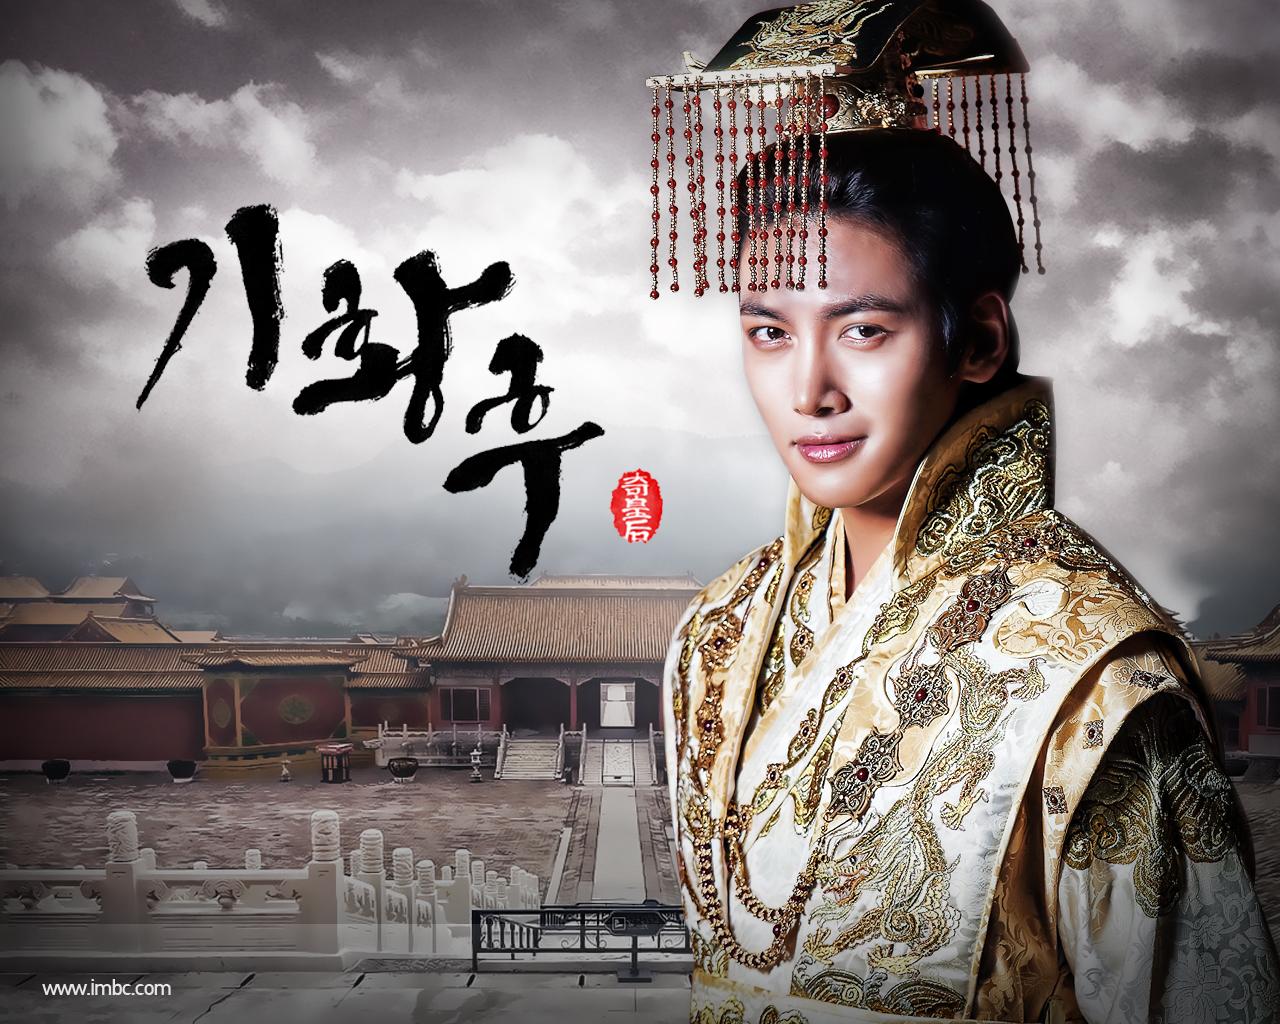 Ji Chang Wook images Empress Ki HD wallpaper and background photos 1280x1024